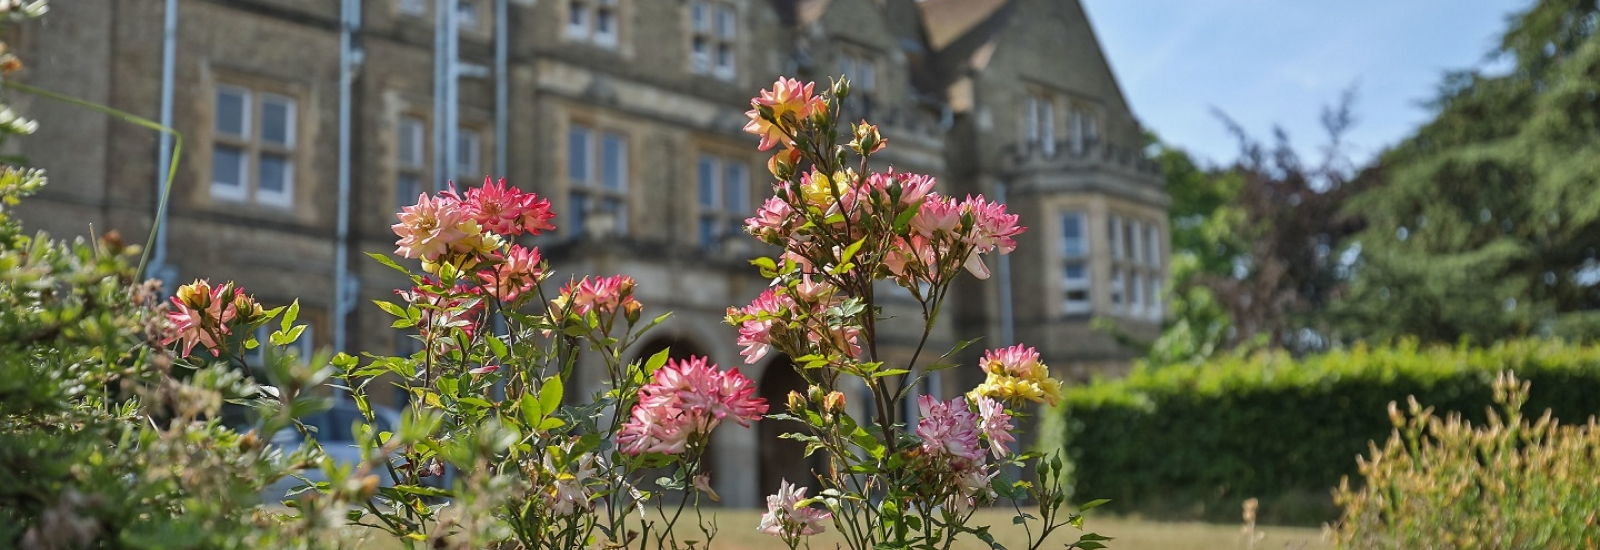 St Hilda's College South Lawn